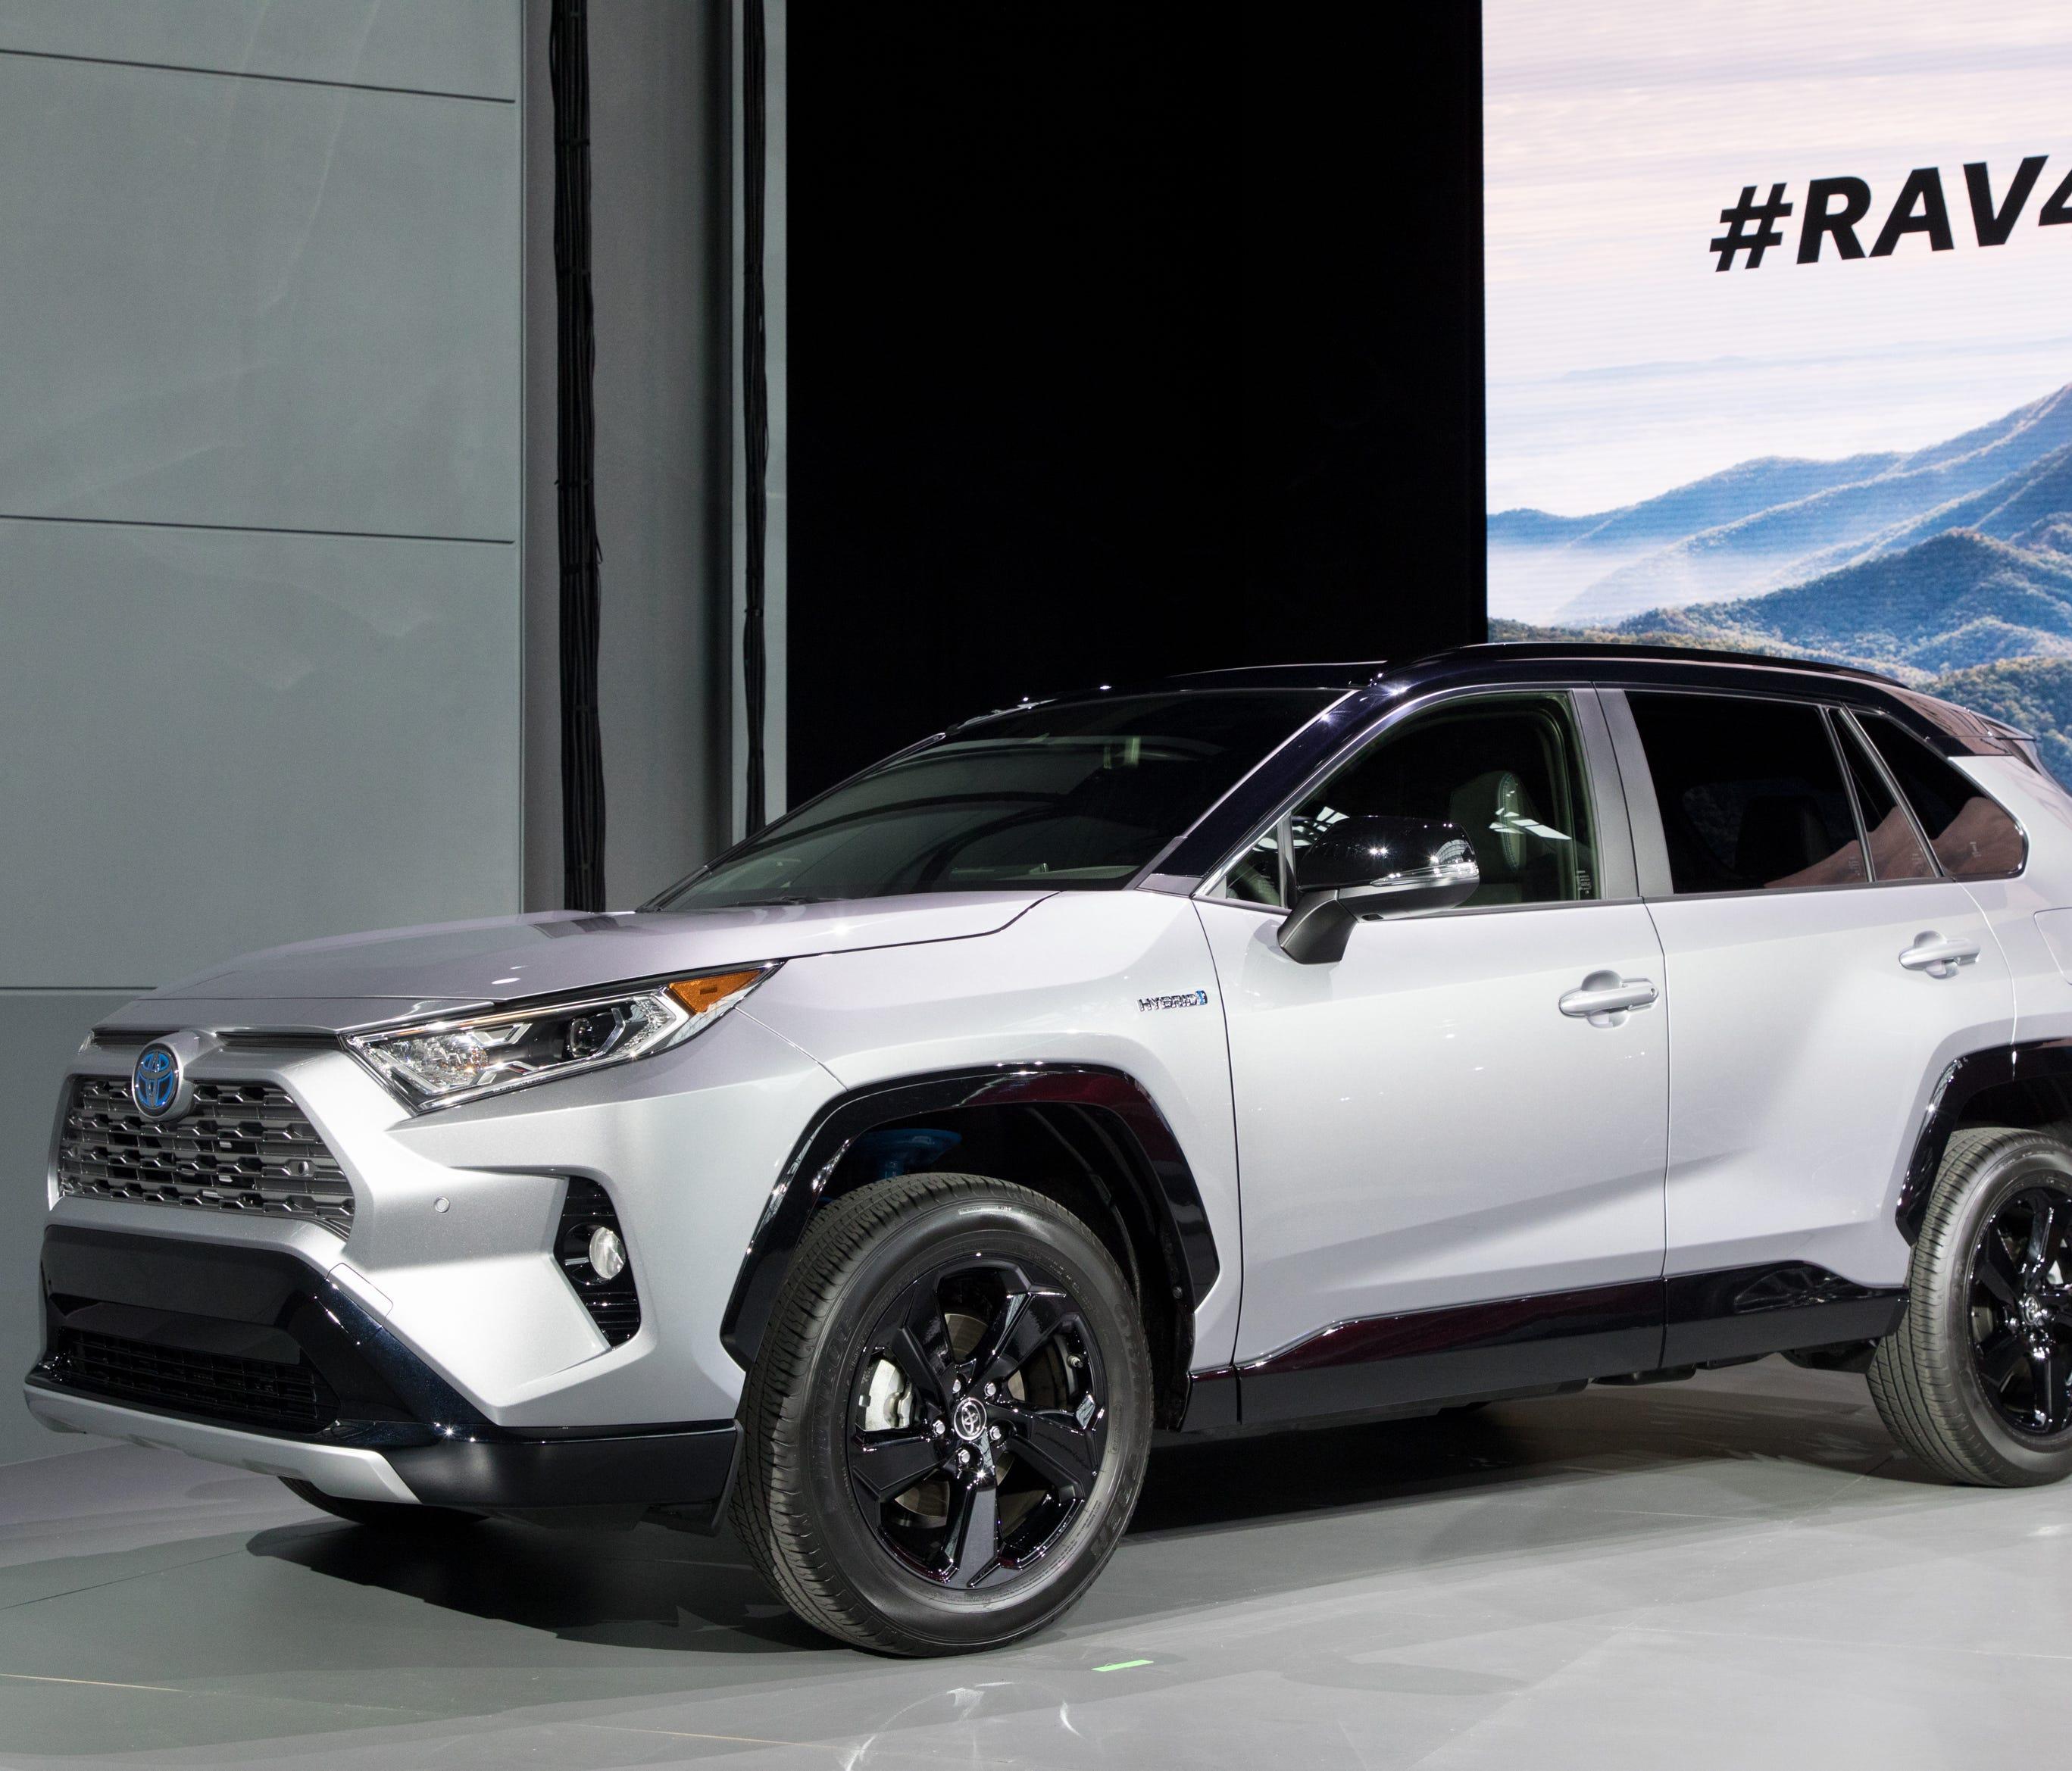 The hybrid version of Toyota's next RAV4 sports a black roof